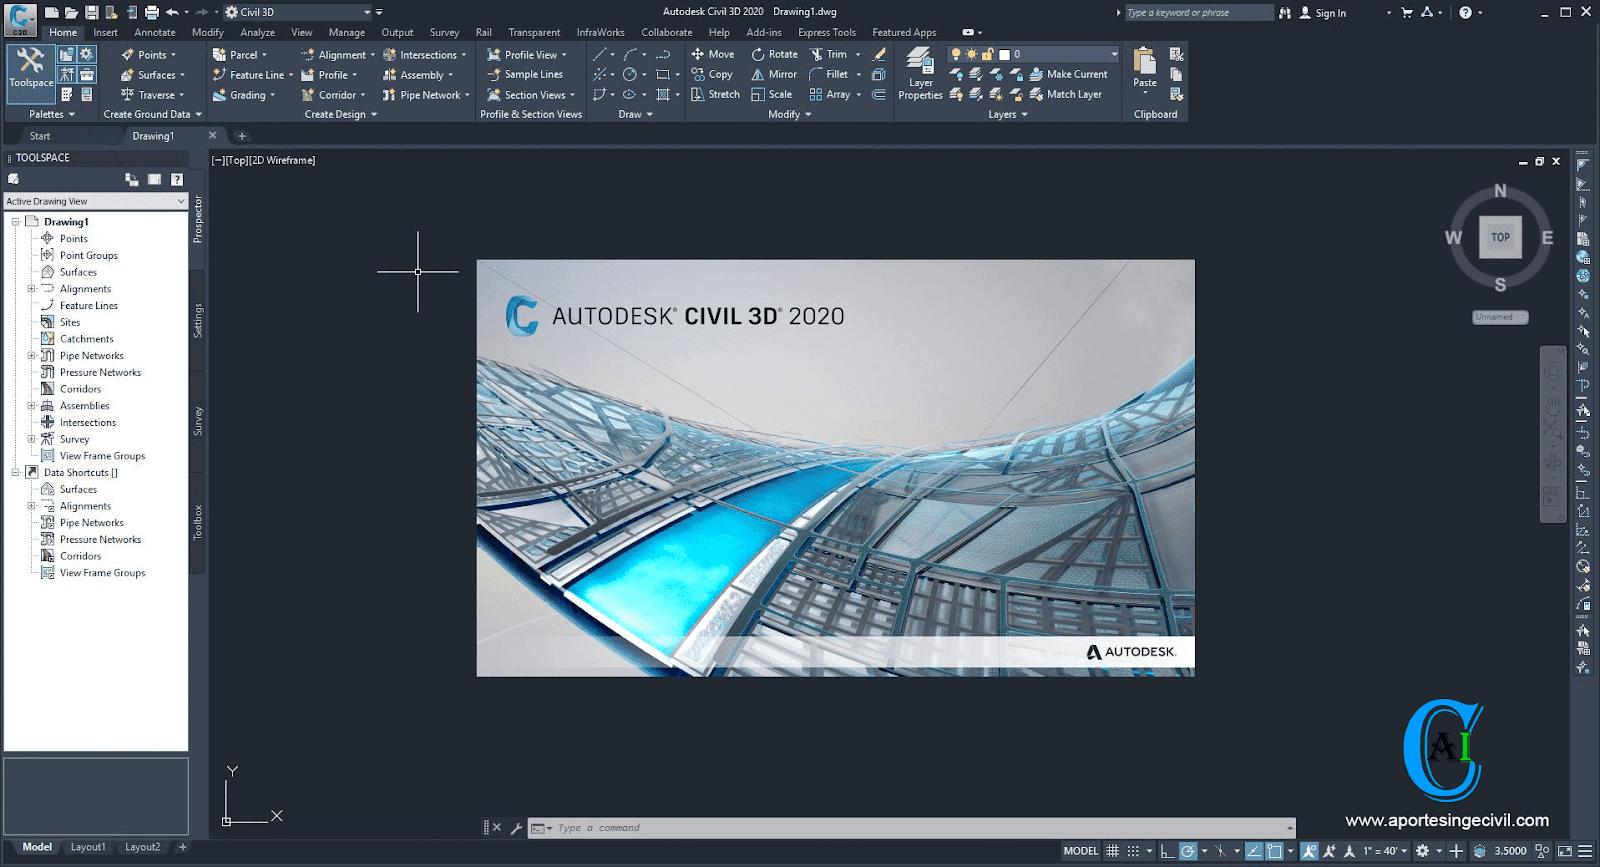 Autodesk Civil 3D 2020 Español e Ingles